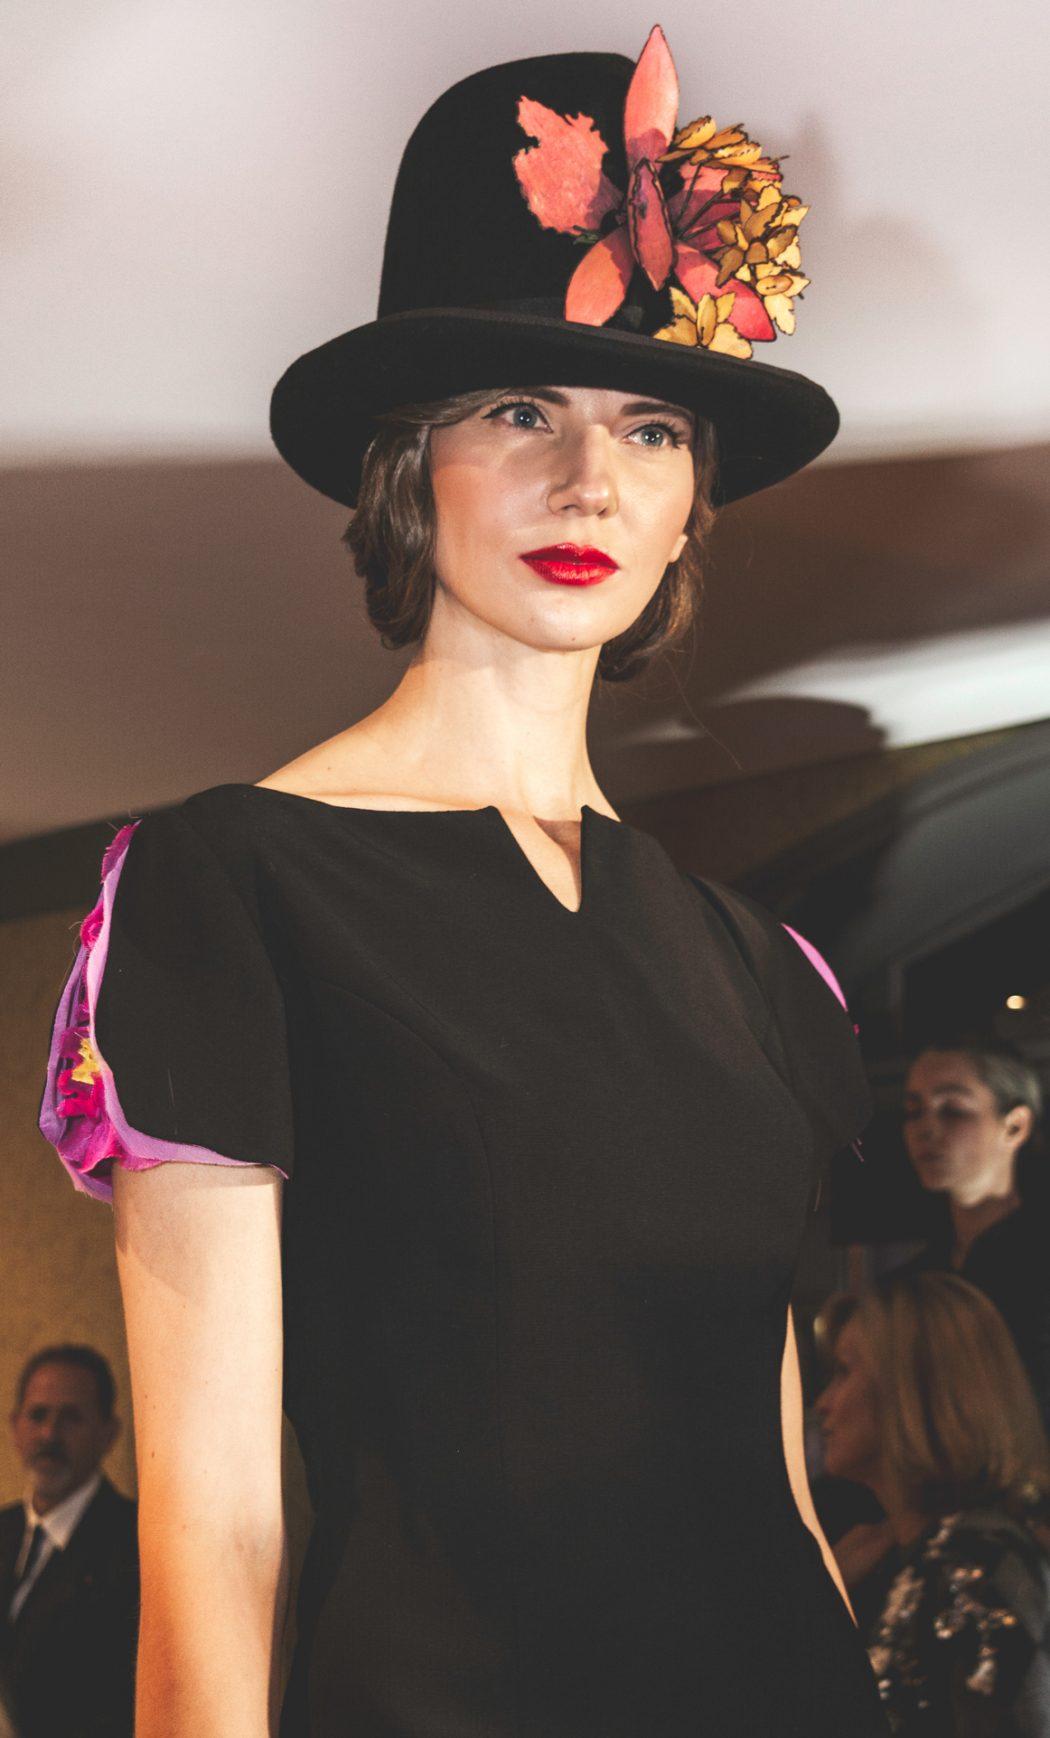 María Luisa Ortiz, Diego Guarnizo